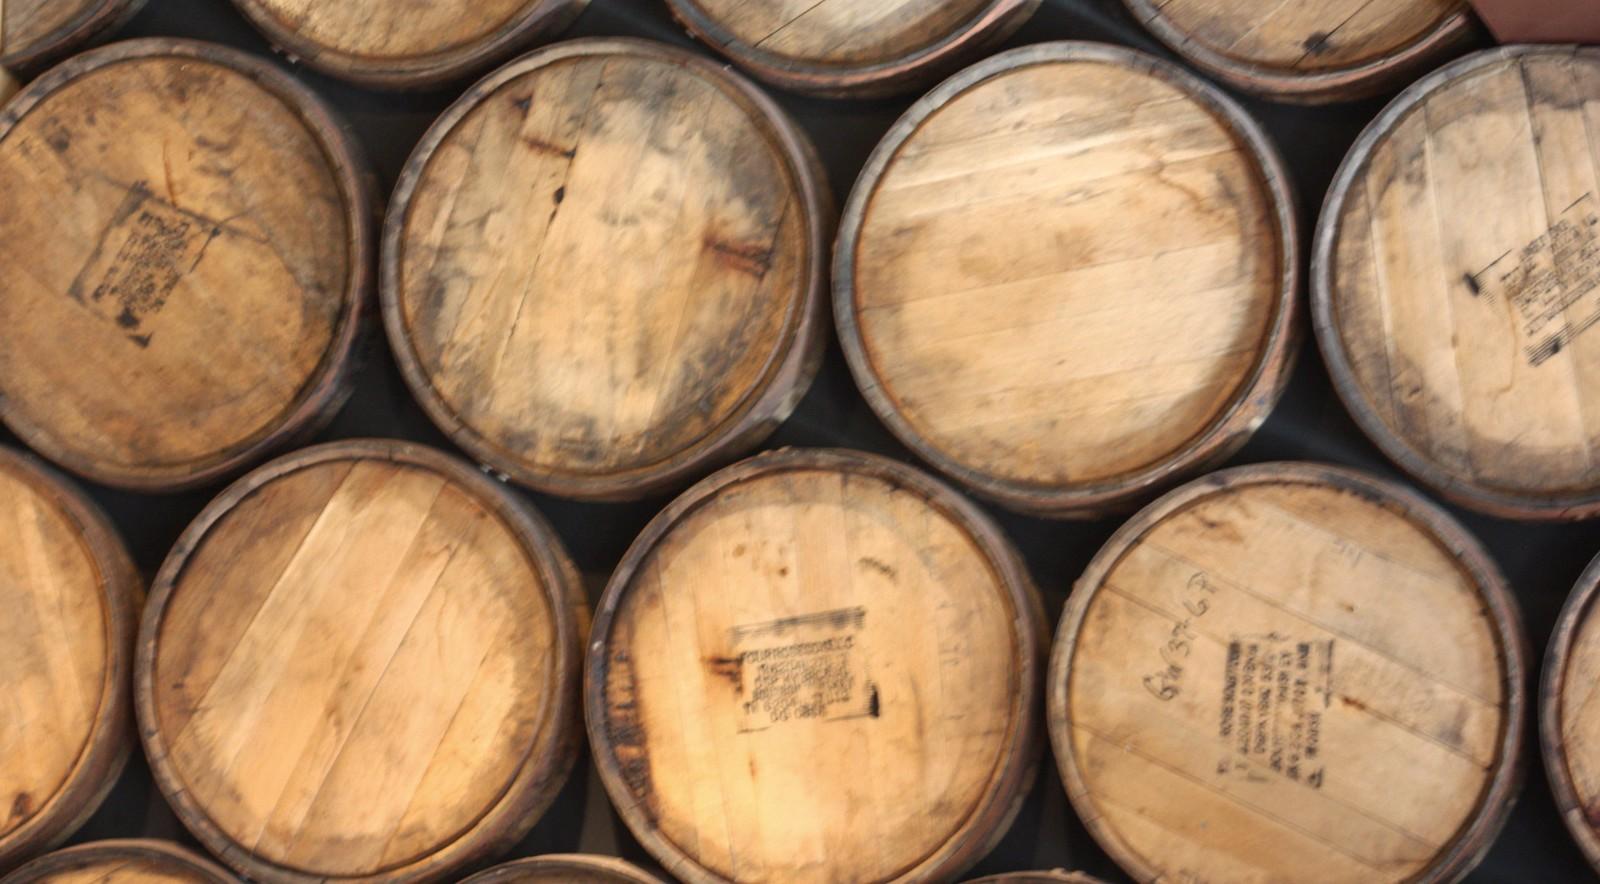 Beer barrels at Great Lakes Brewing Co